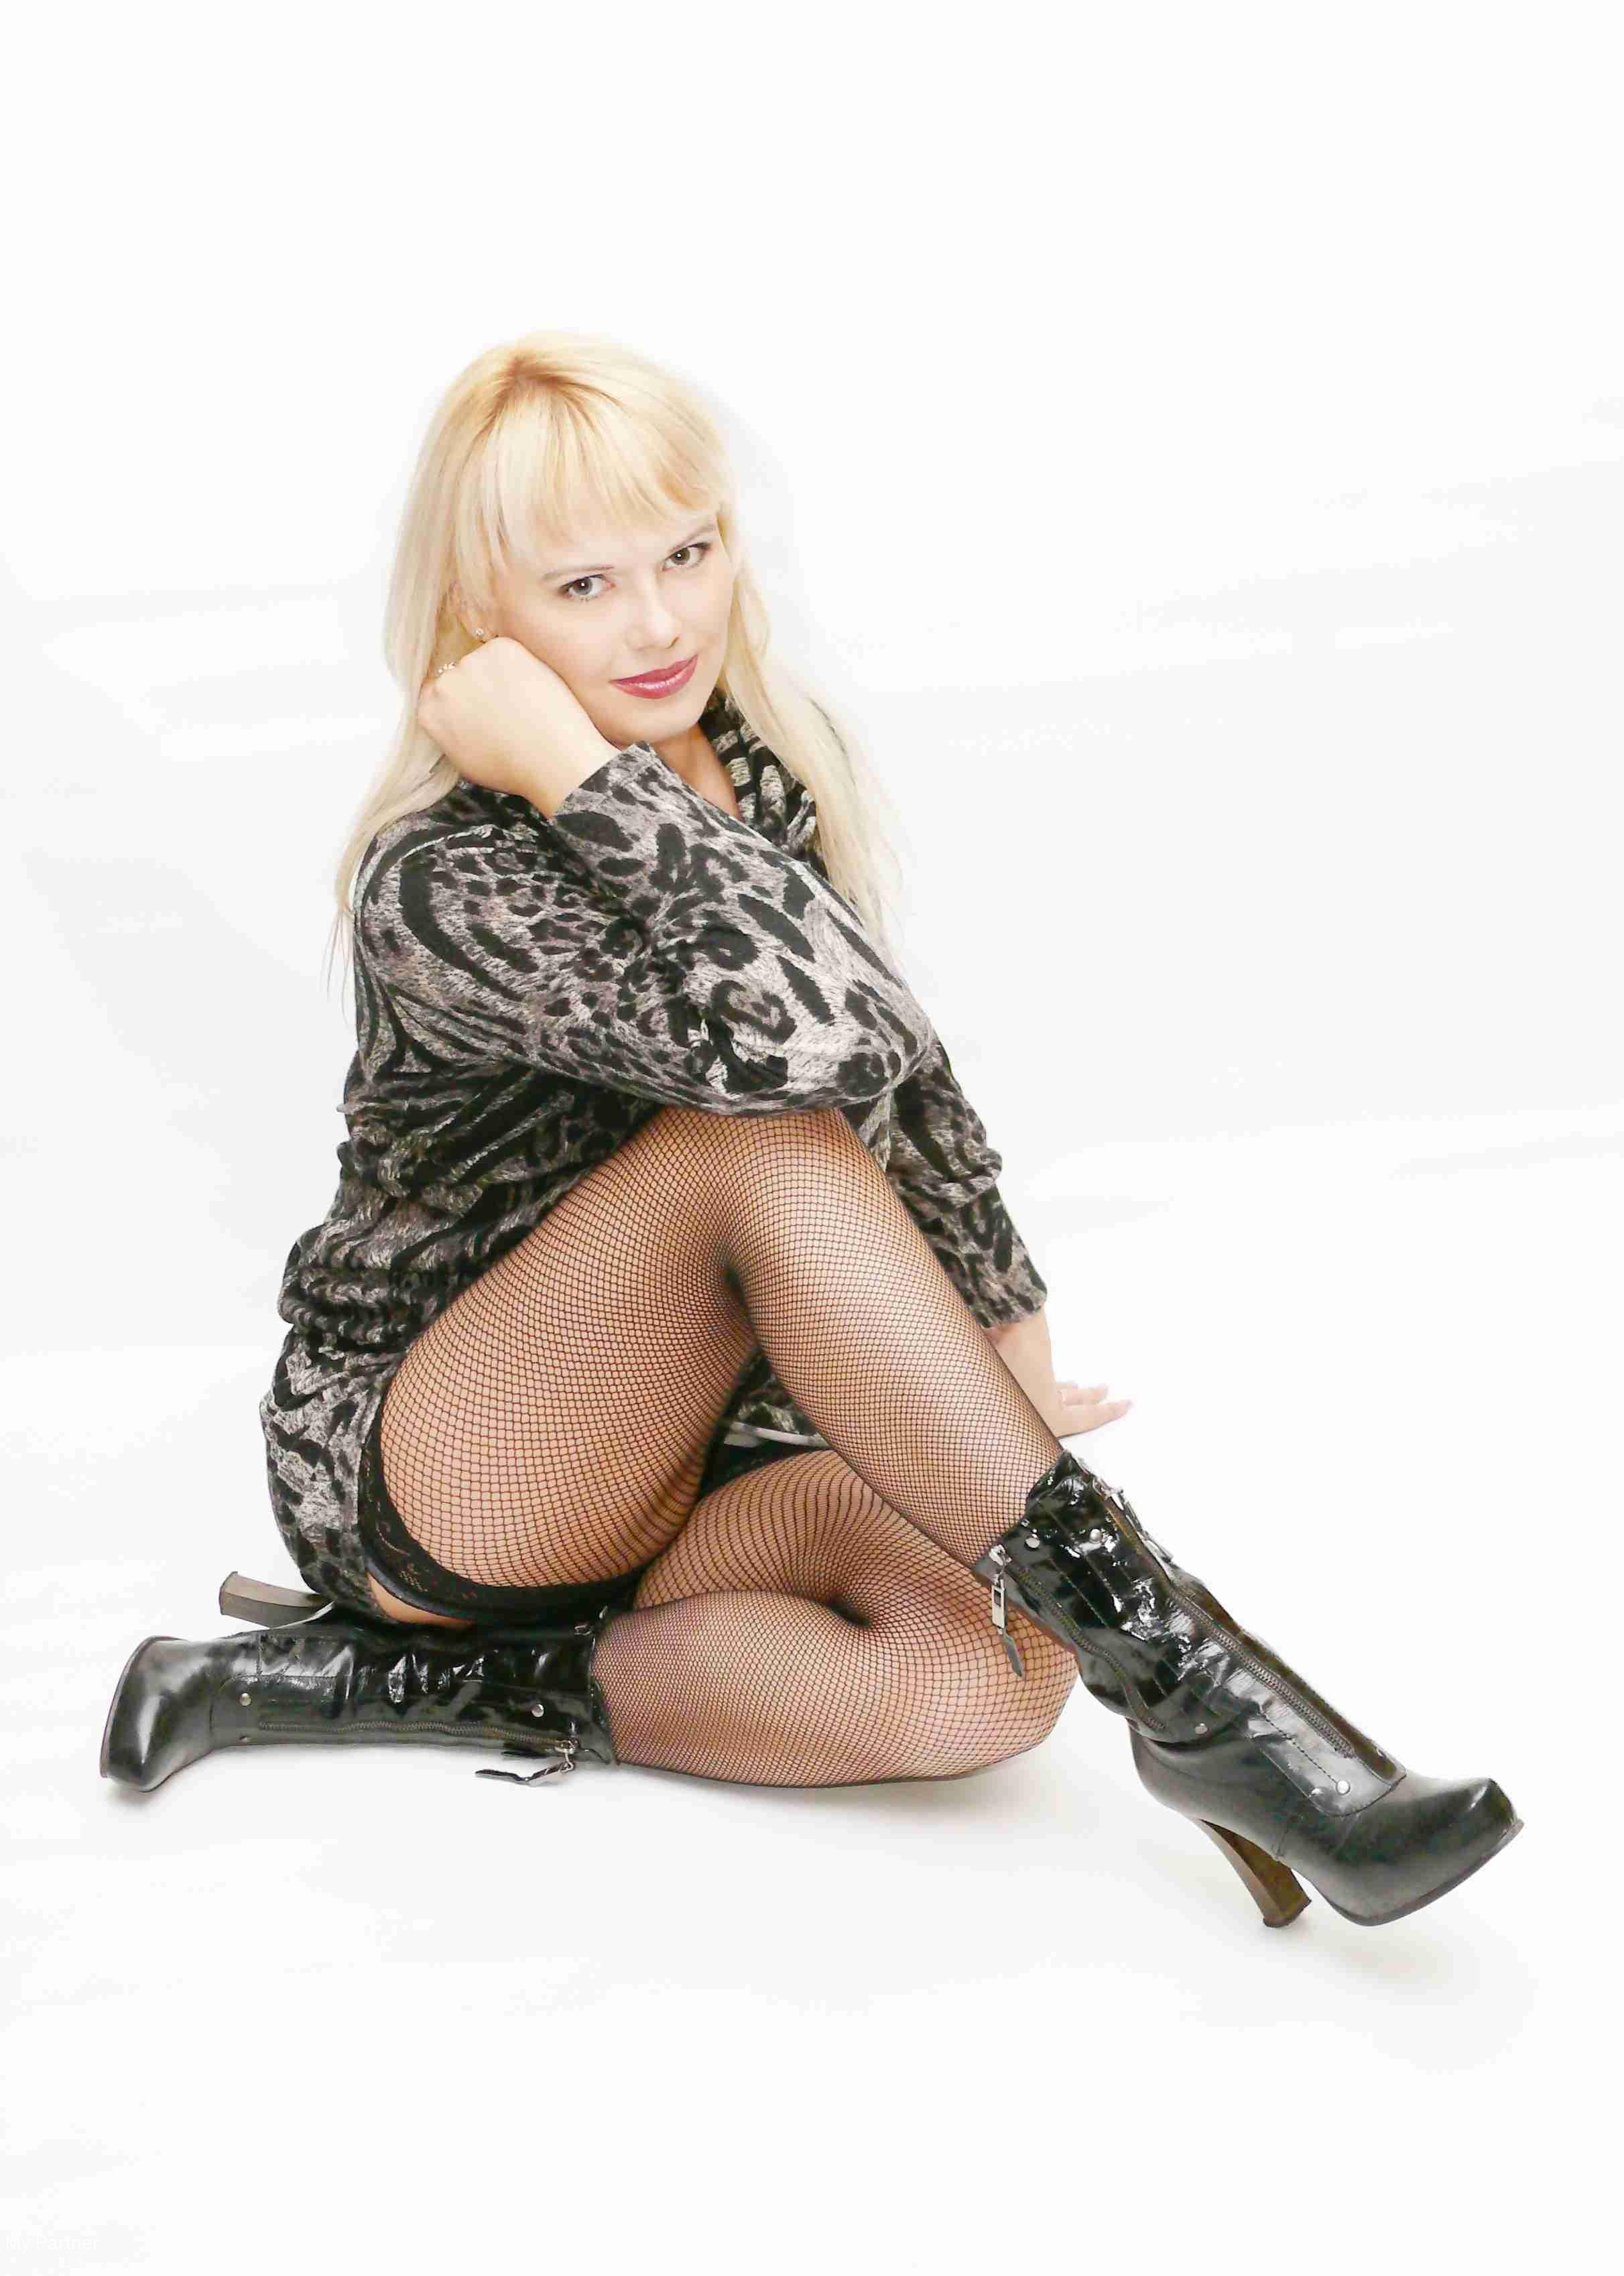 Single Woman From Ukrain 42